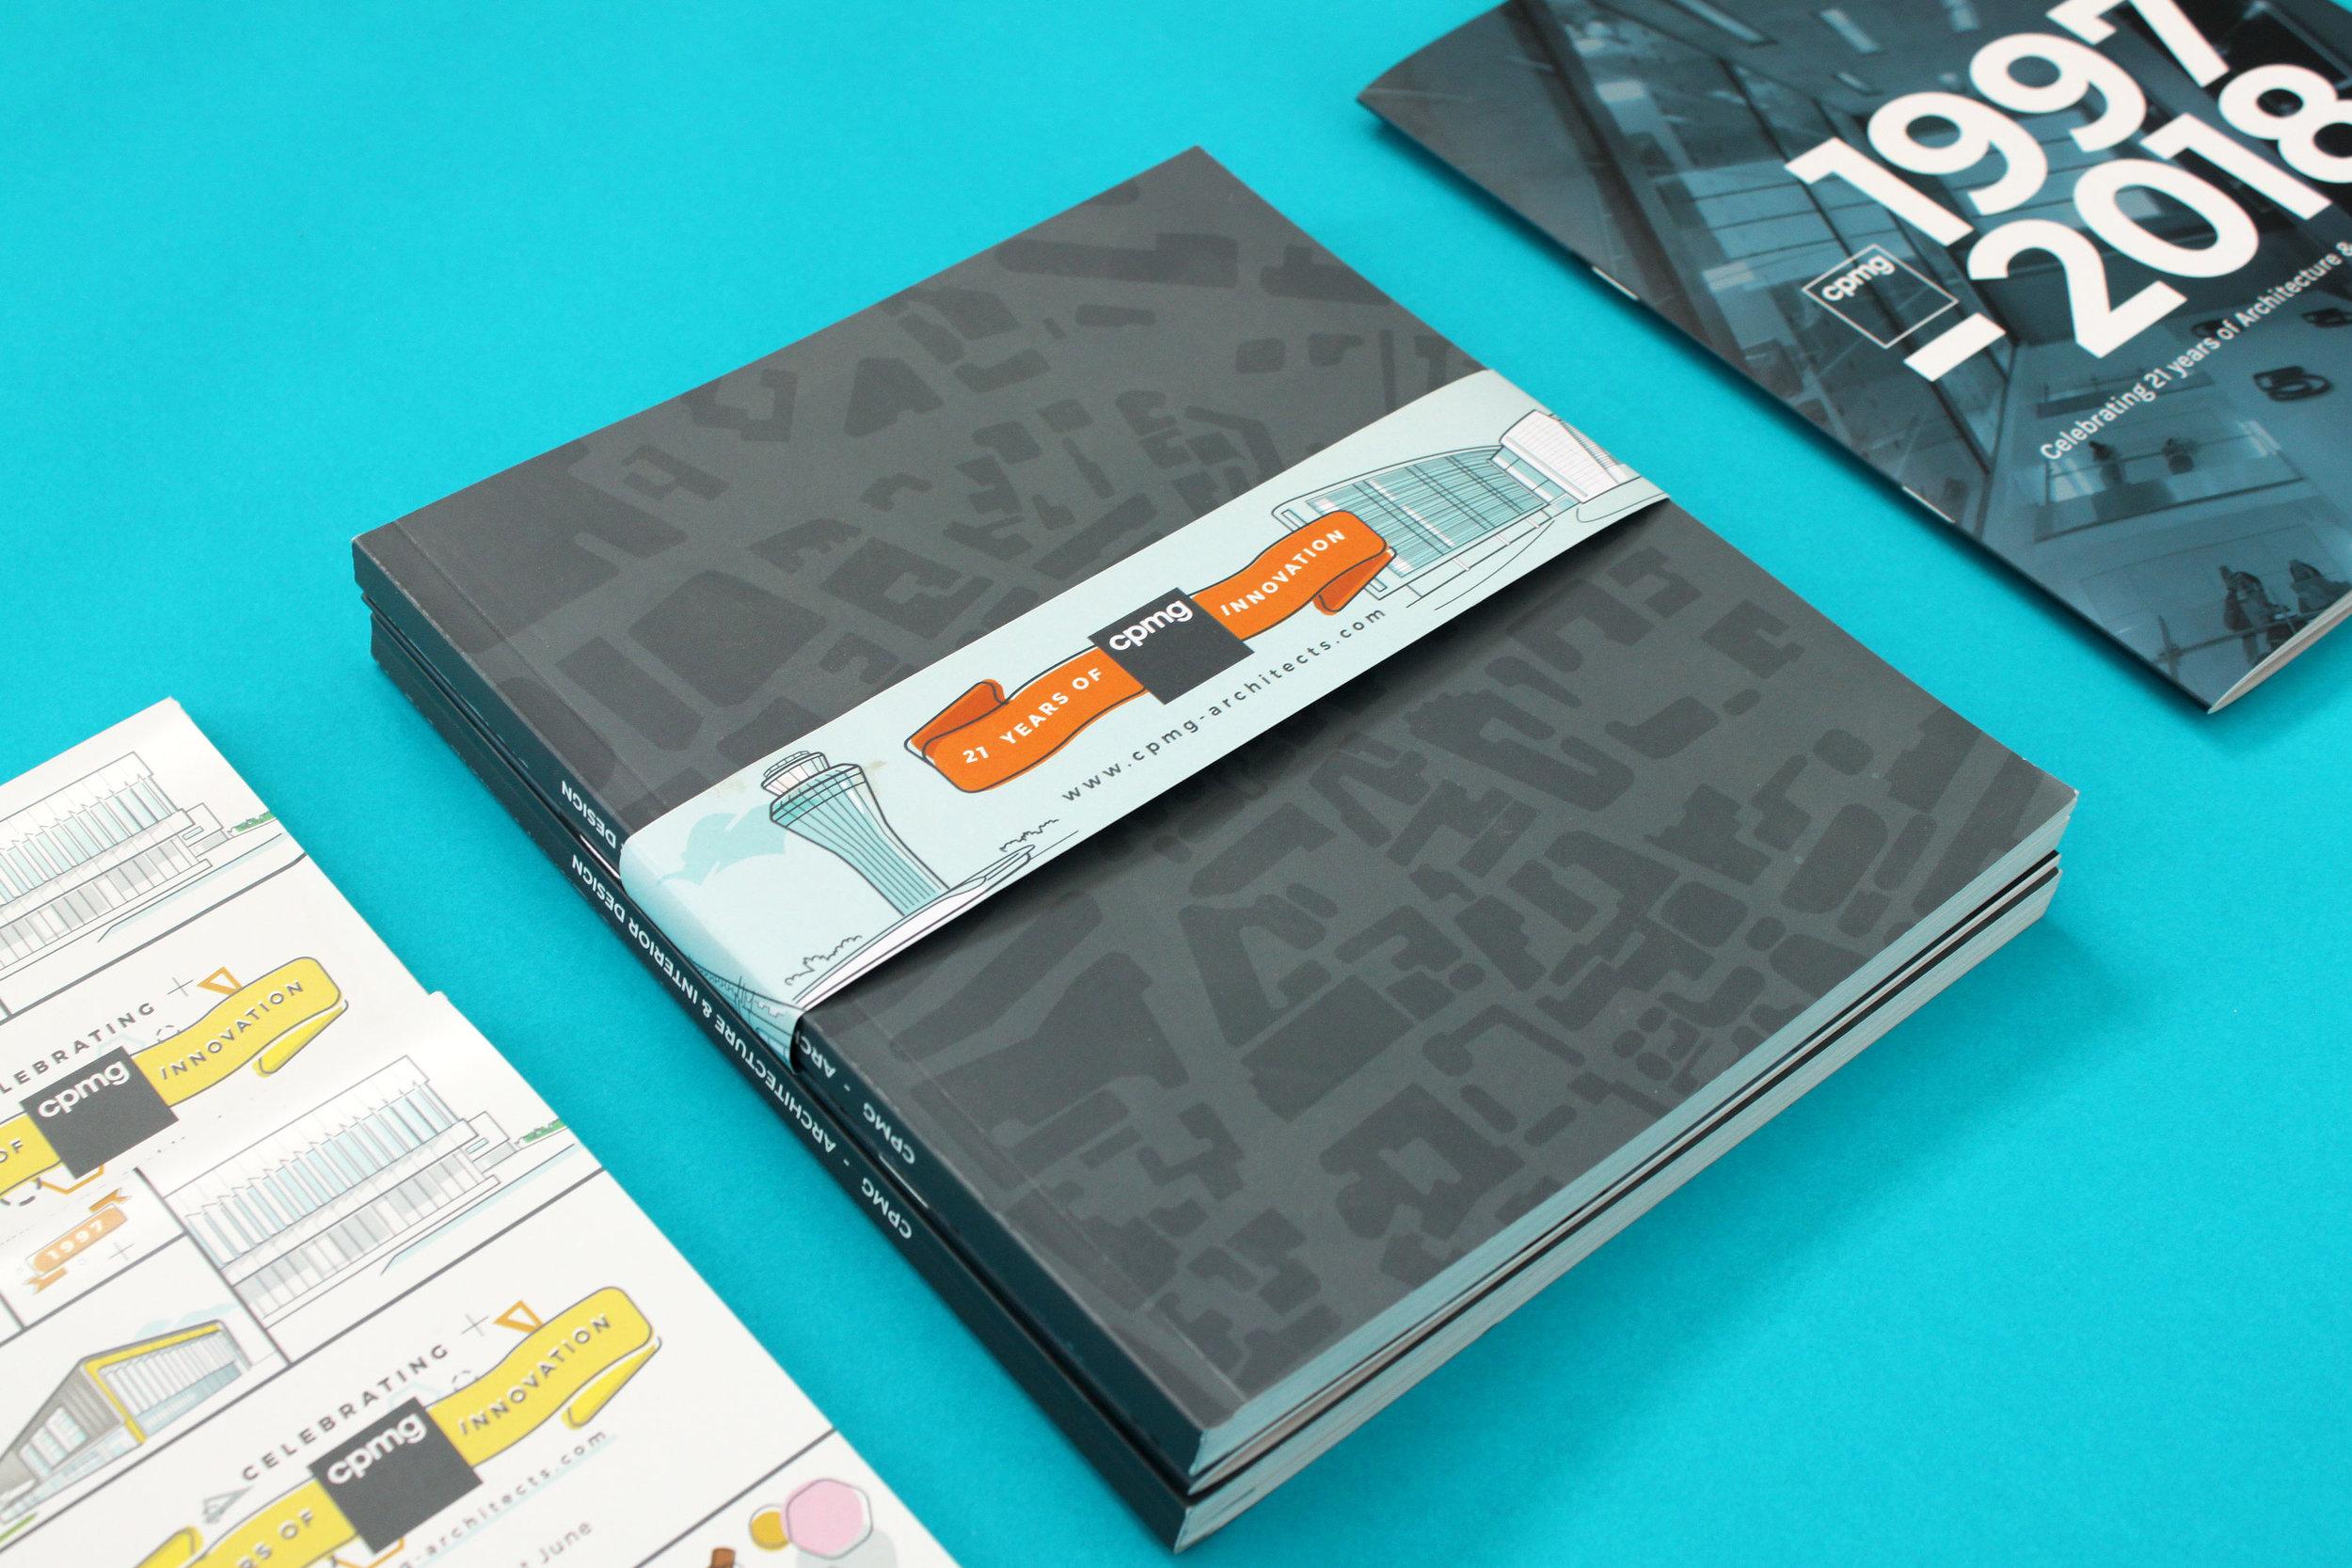 cpmg-2018-brochure-jess-bright-design.jpg